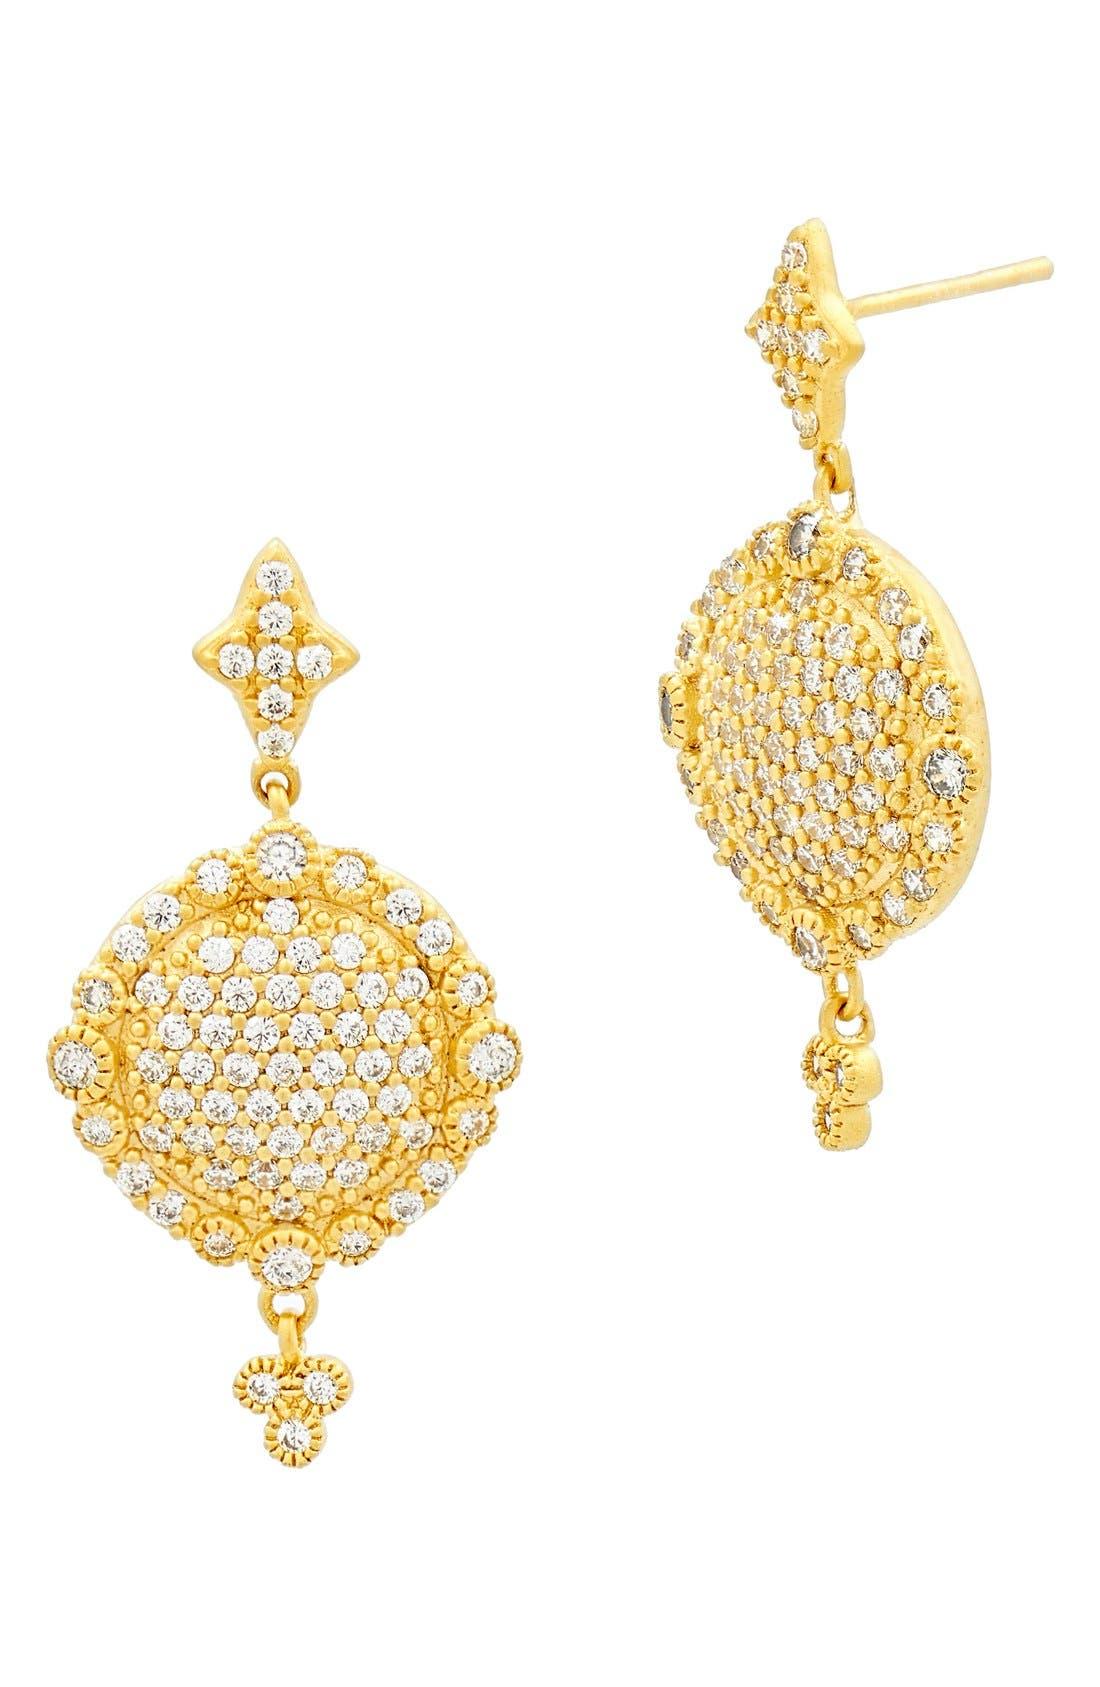 FREIDA ROTHMAN 'Mercer' Pavé Drop Earrings